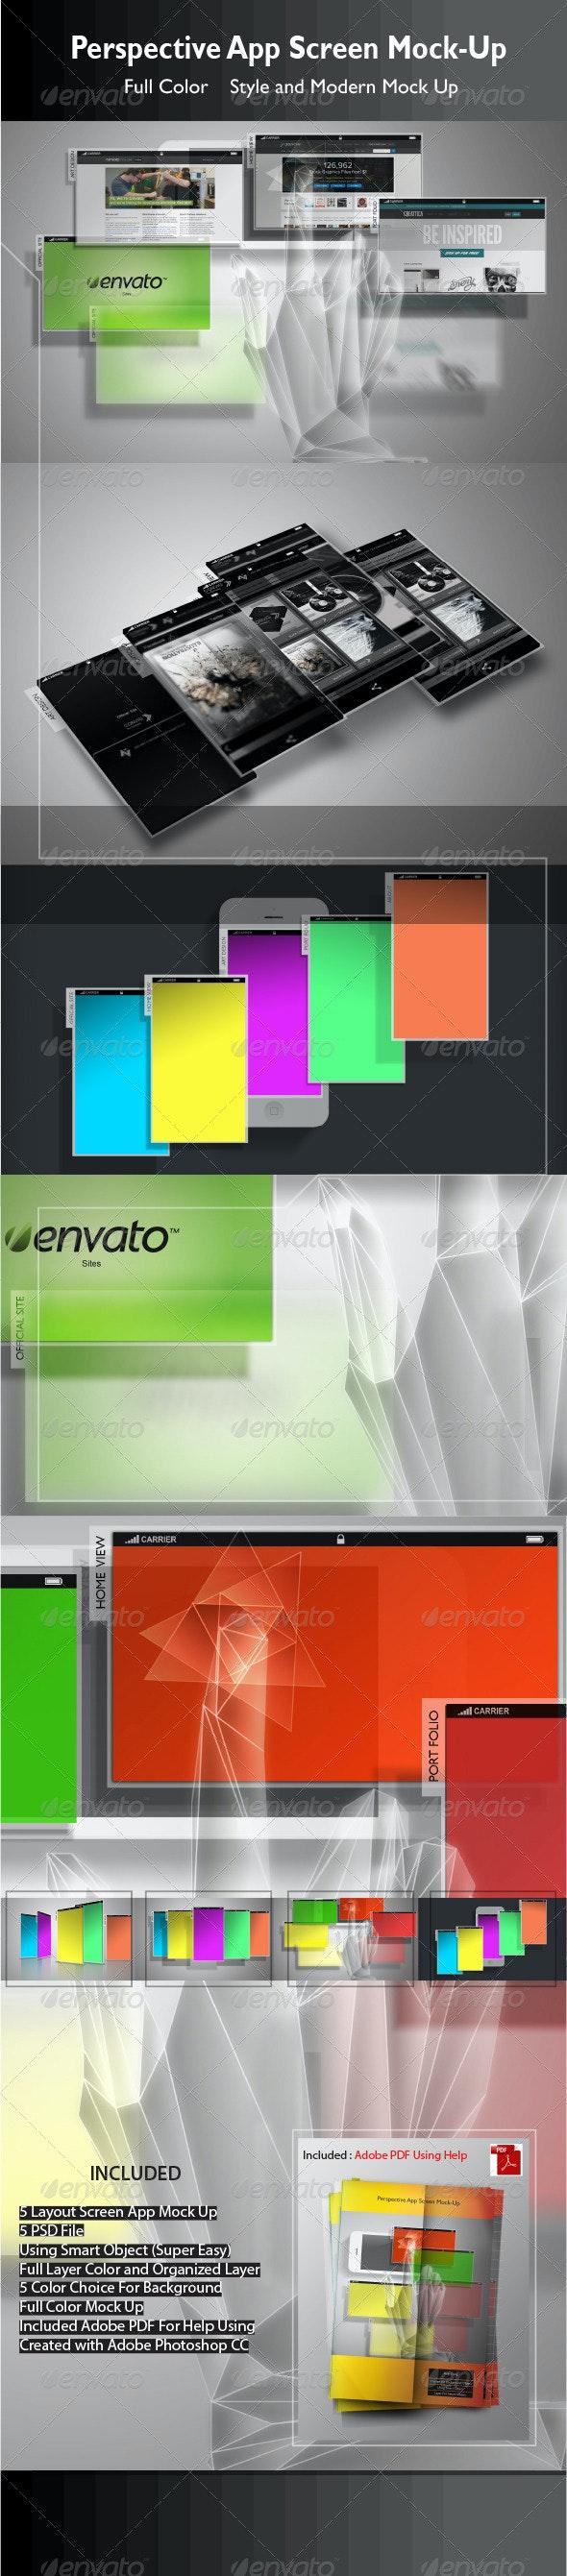 Perspective App Screen Mock-Up - Mobile Displays